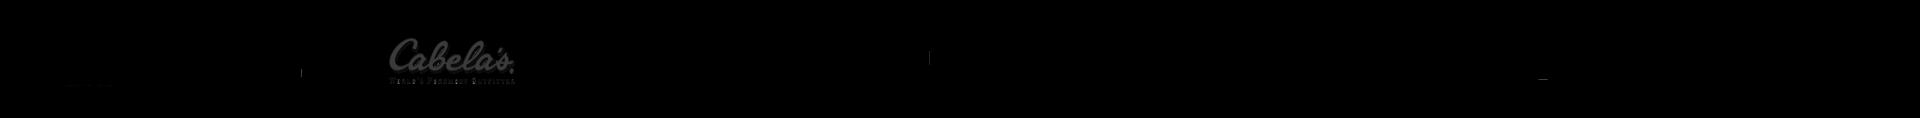 logo parade 3